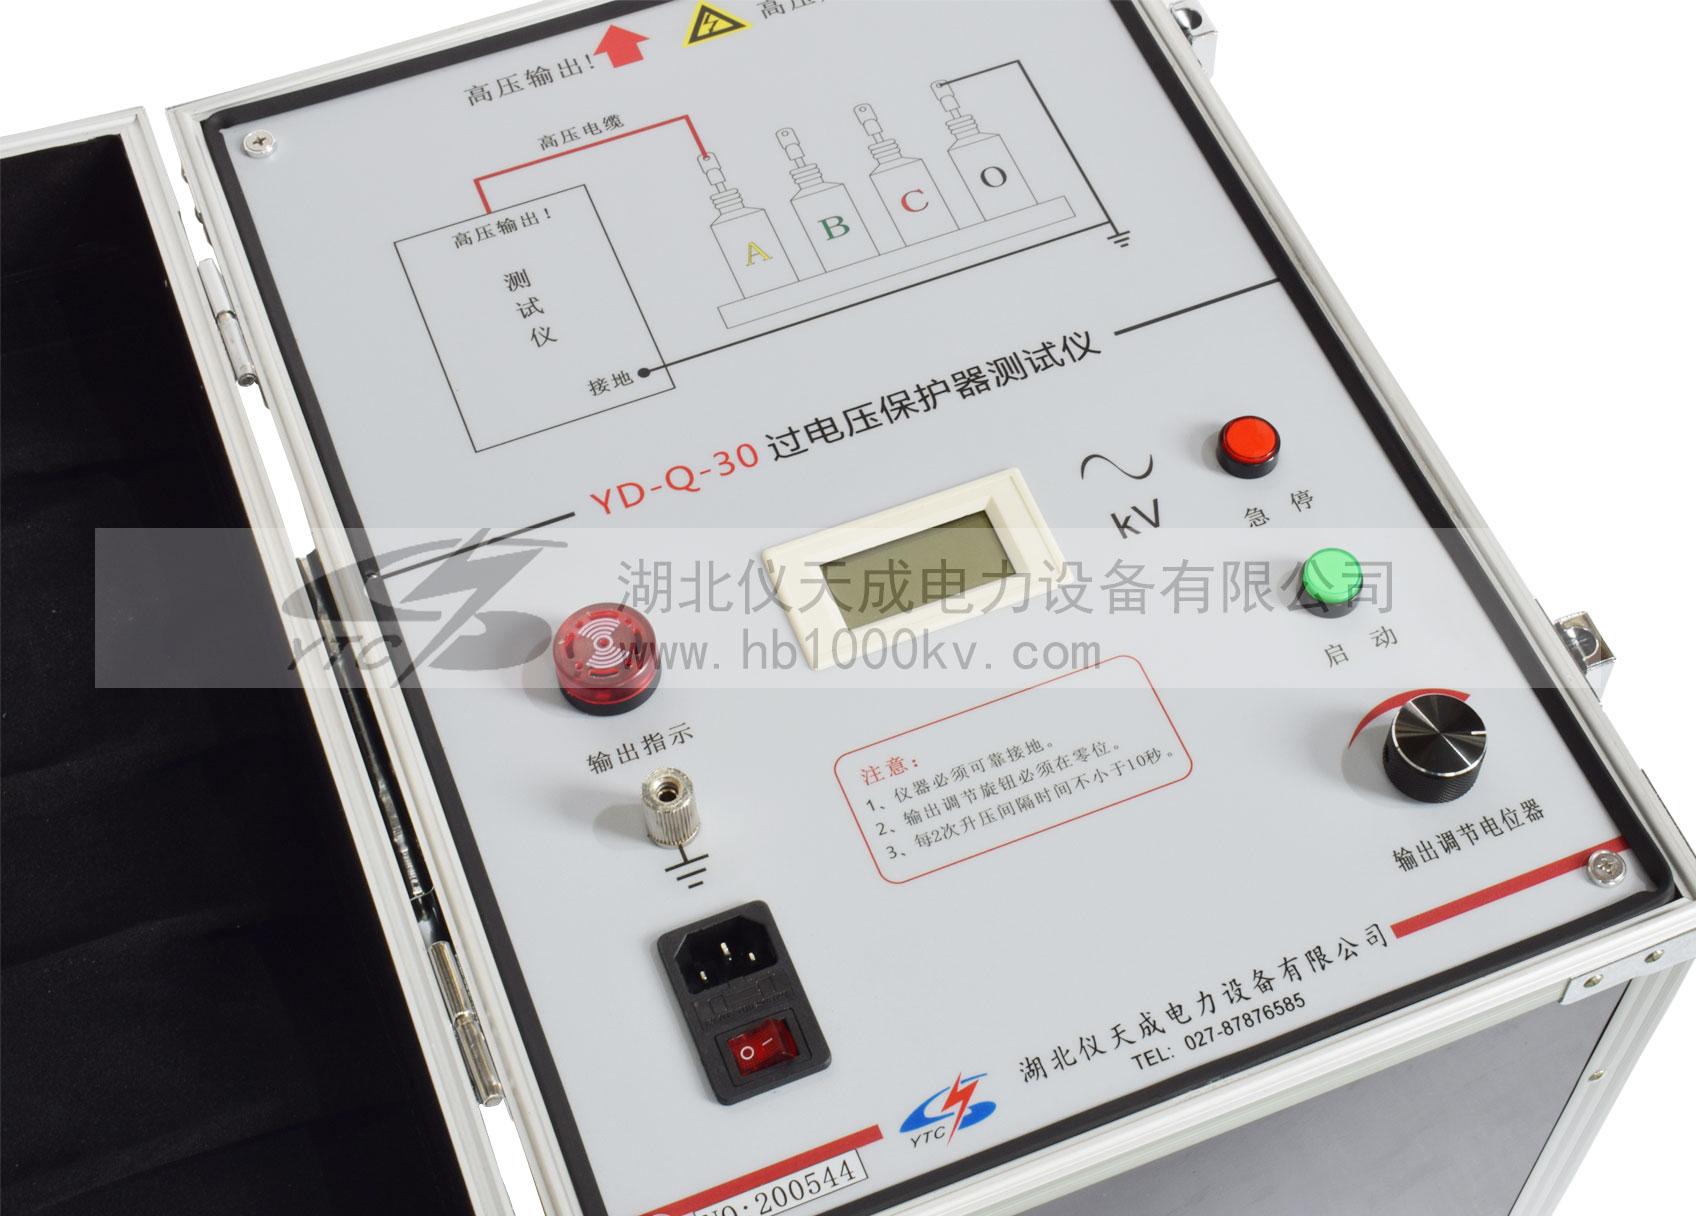 YD-Q-30过电压保护器测试仪面板图